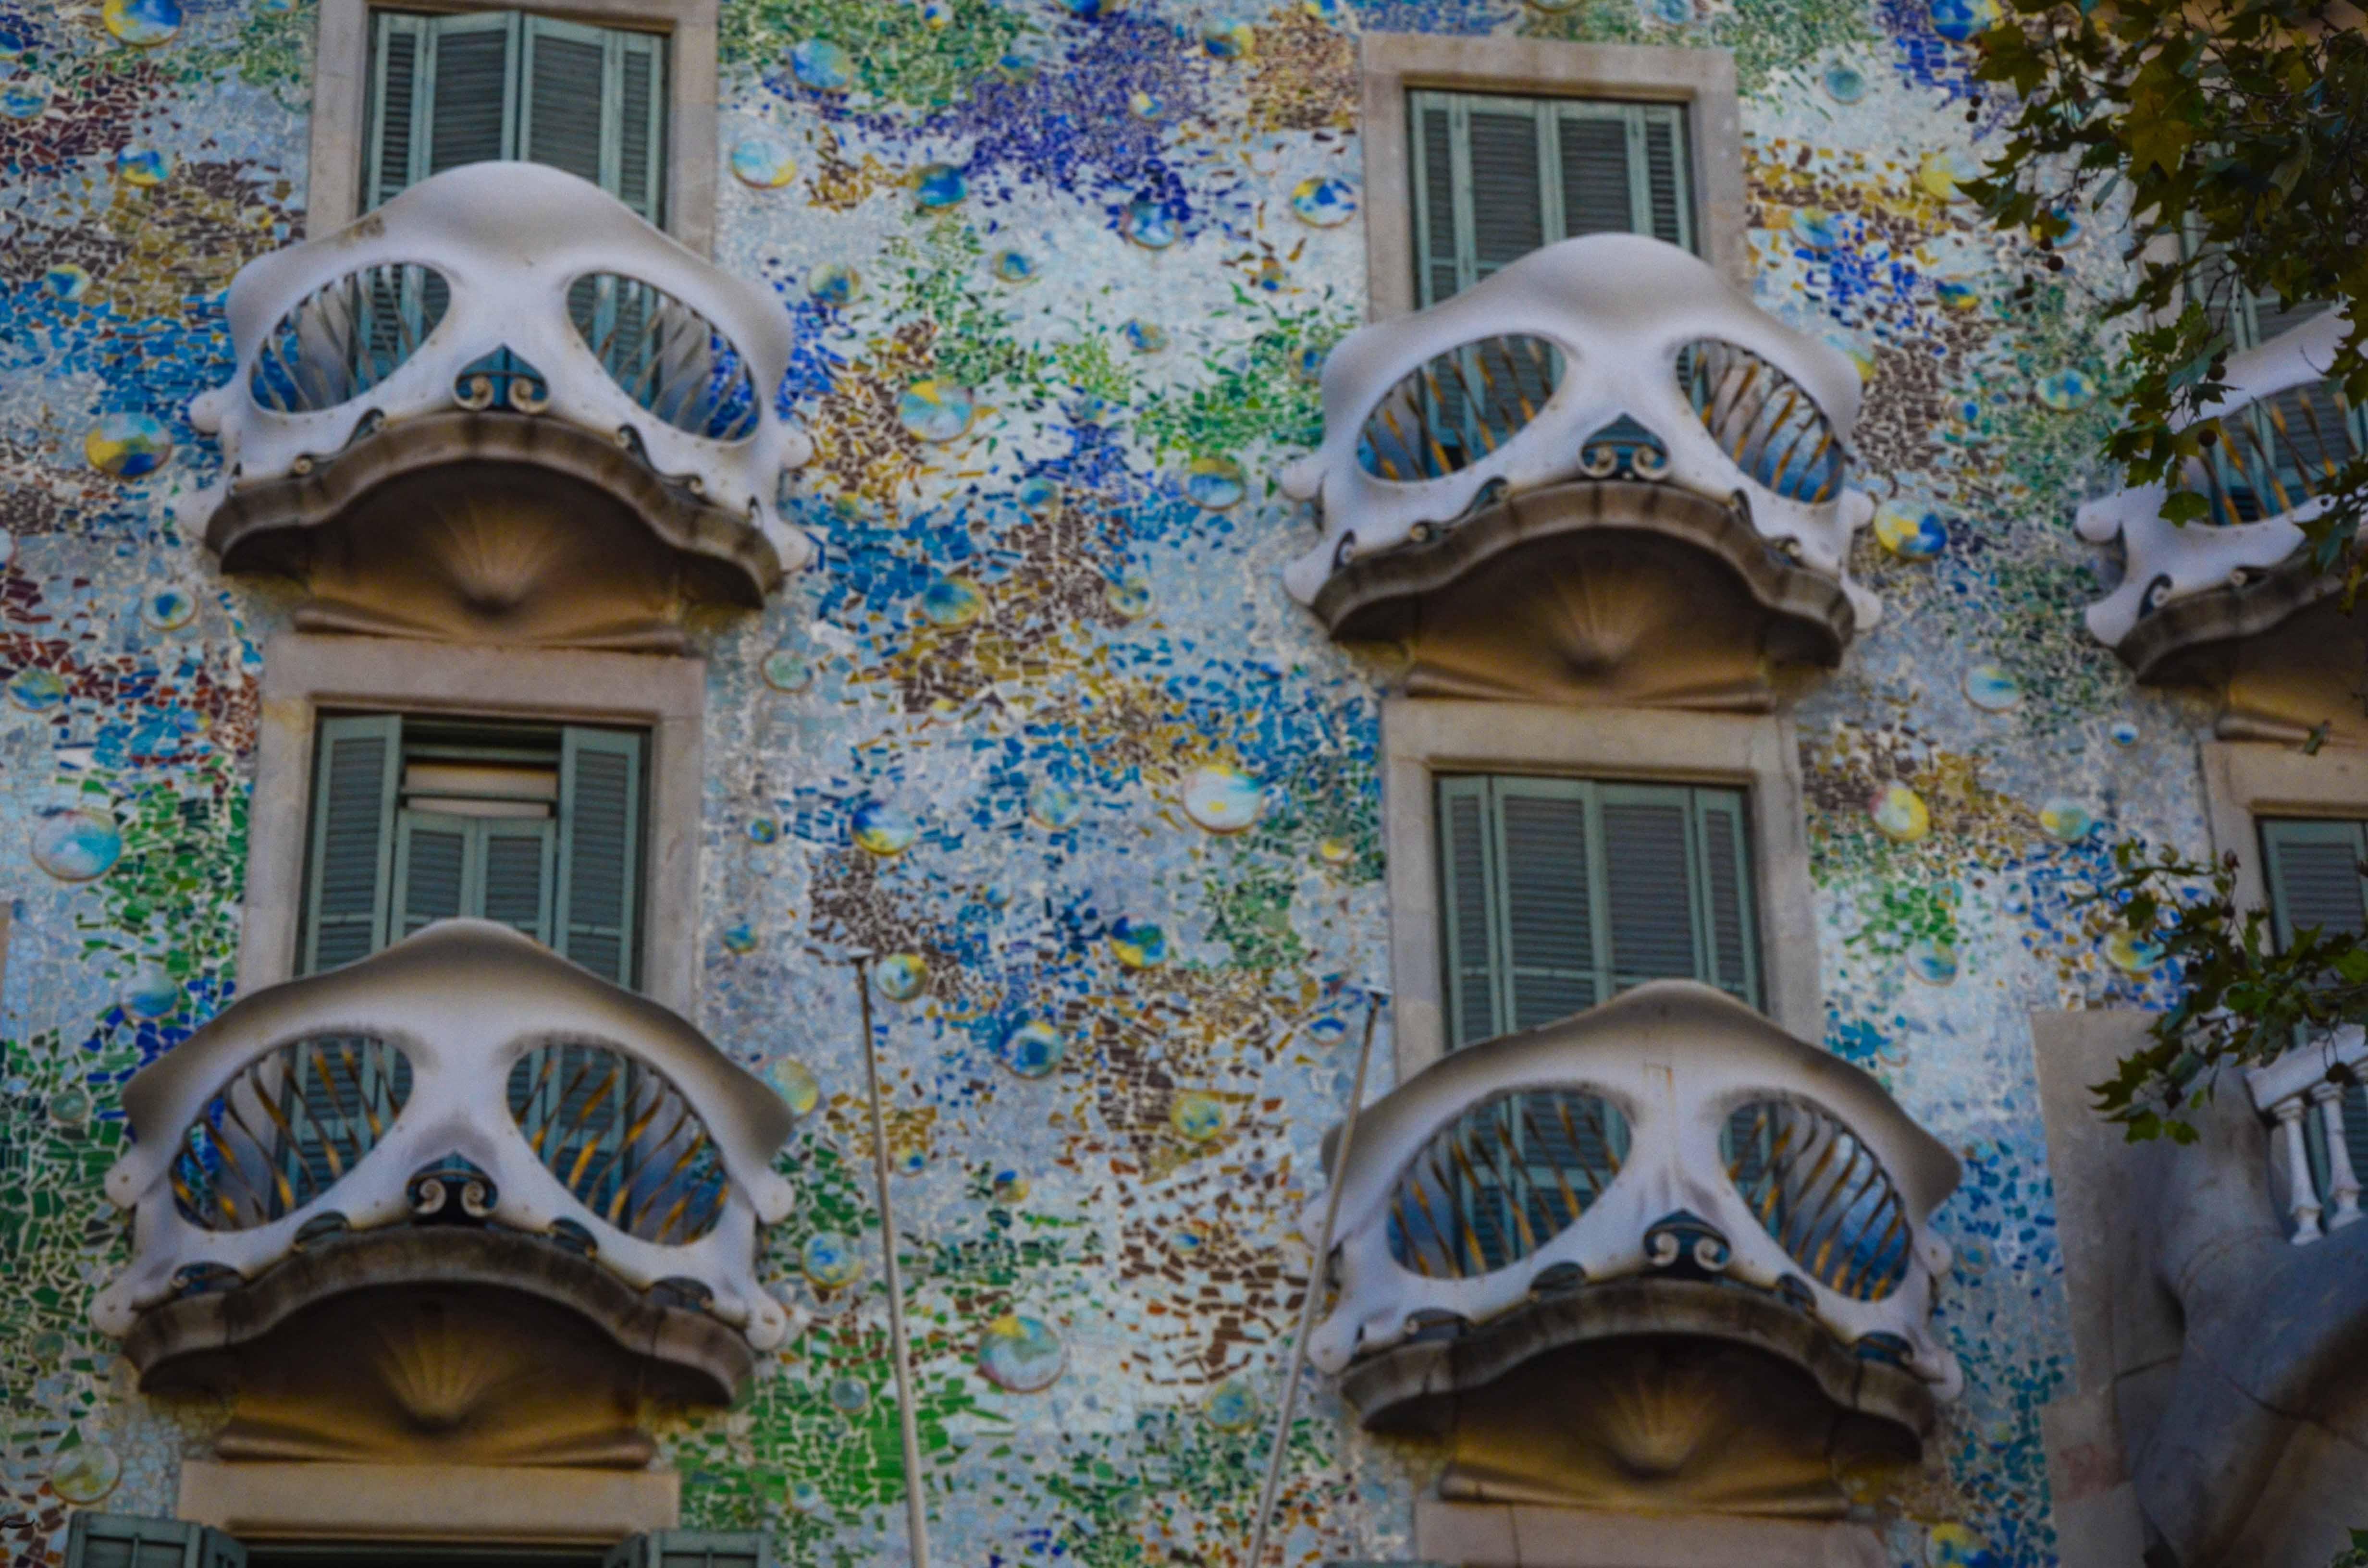 My Barcelona heritage weekend – A Dartmoor blog